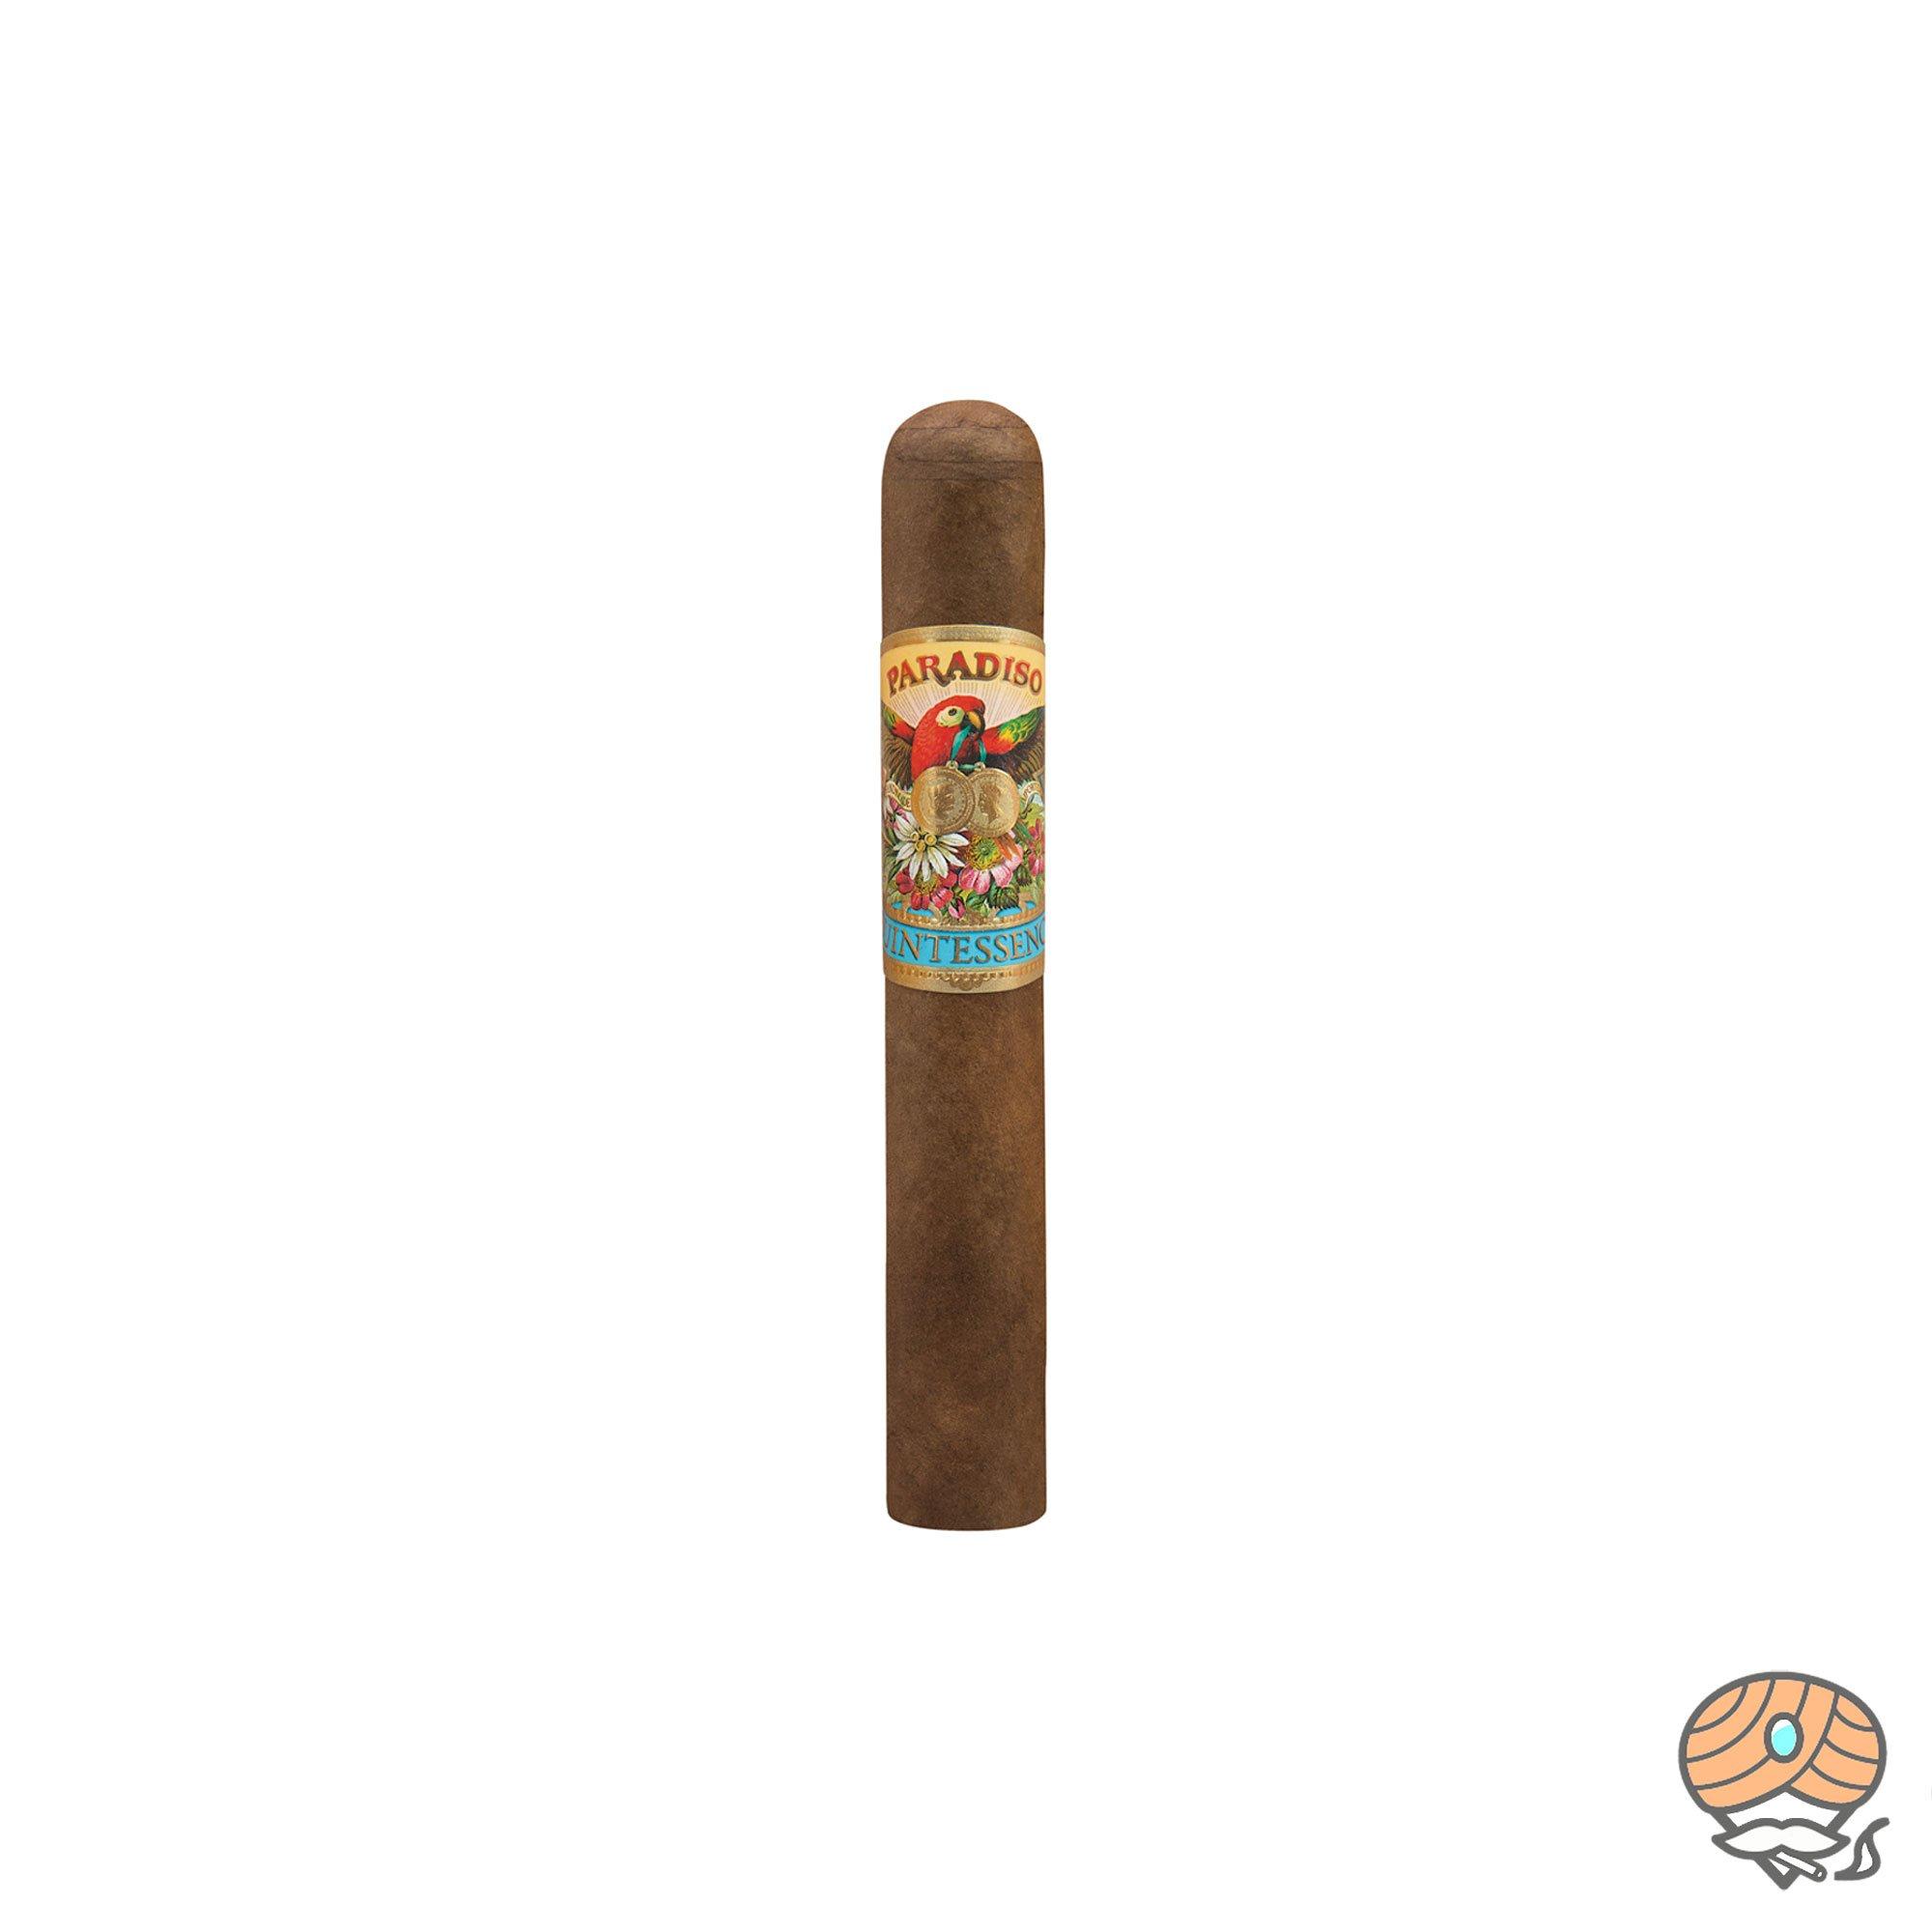 Paradiso Quintessence Robusto Zigarre aus Nicaragua